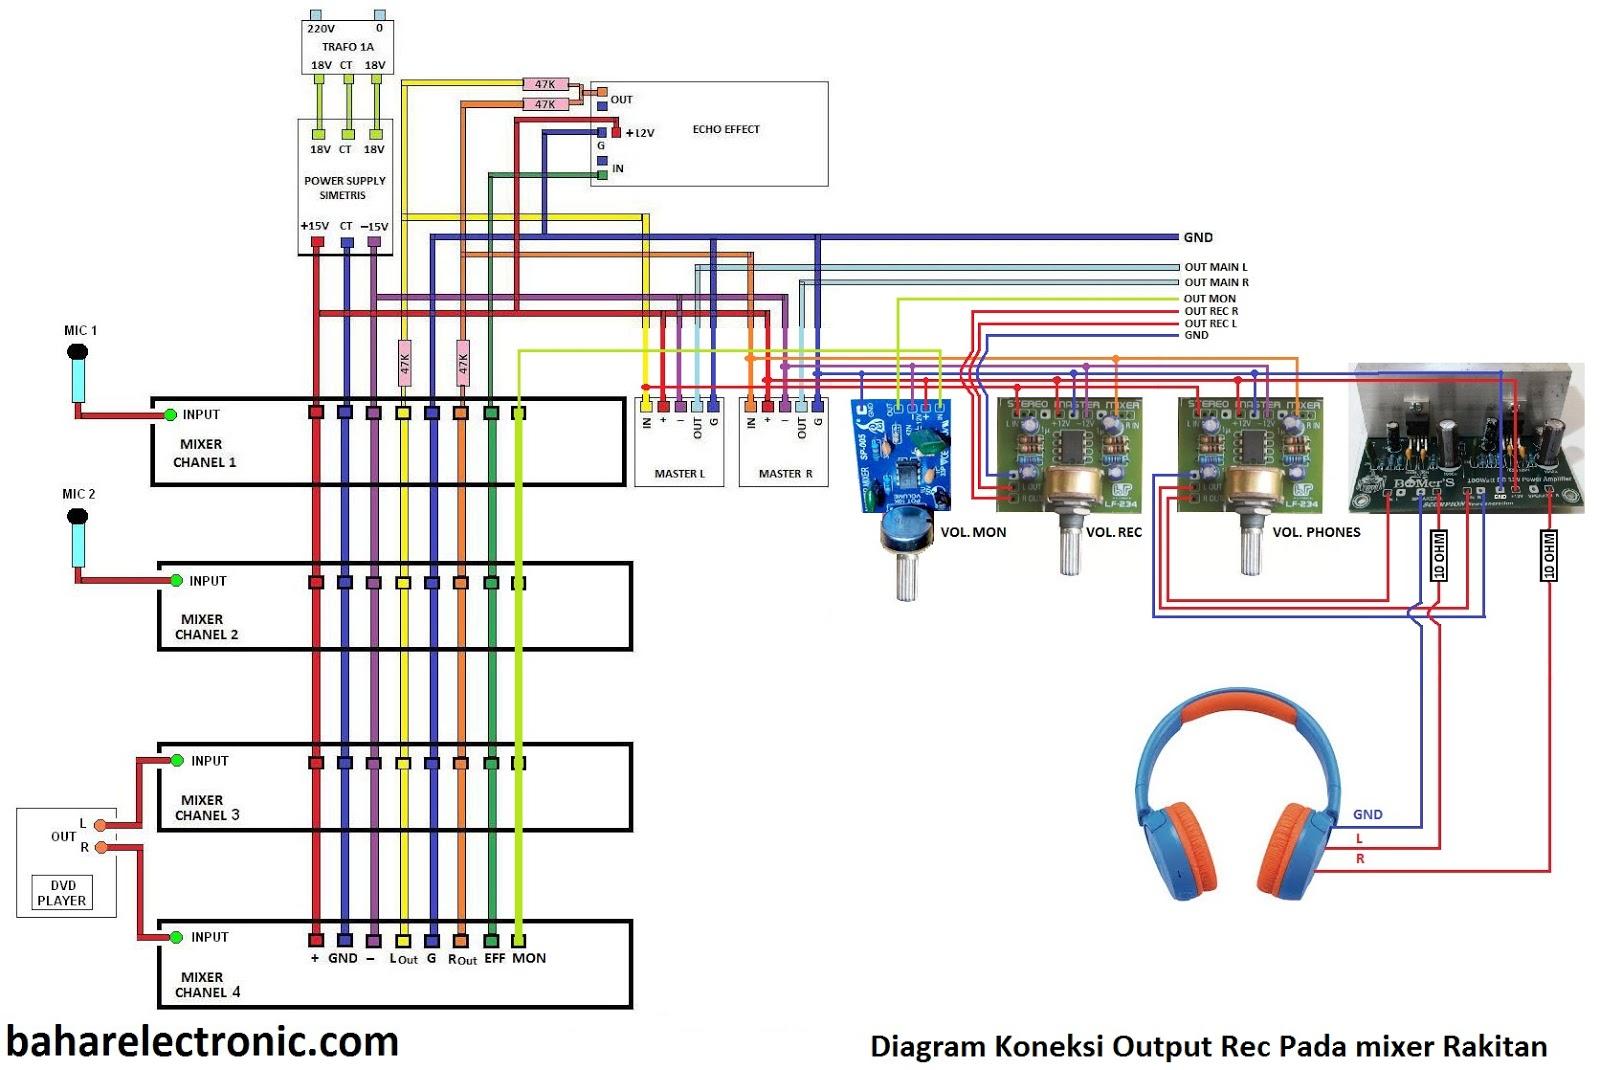 Bahar Electronic Cara Merakit Mixer Audio Sound System Tone Control Mono Modifikasi Dan Assesoris Penambahan Output Rec Pada Rakitan Berikut Gambar Koneksi